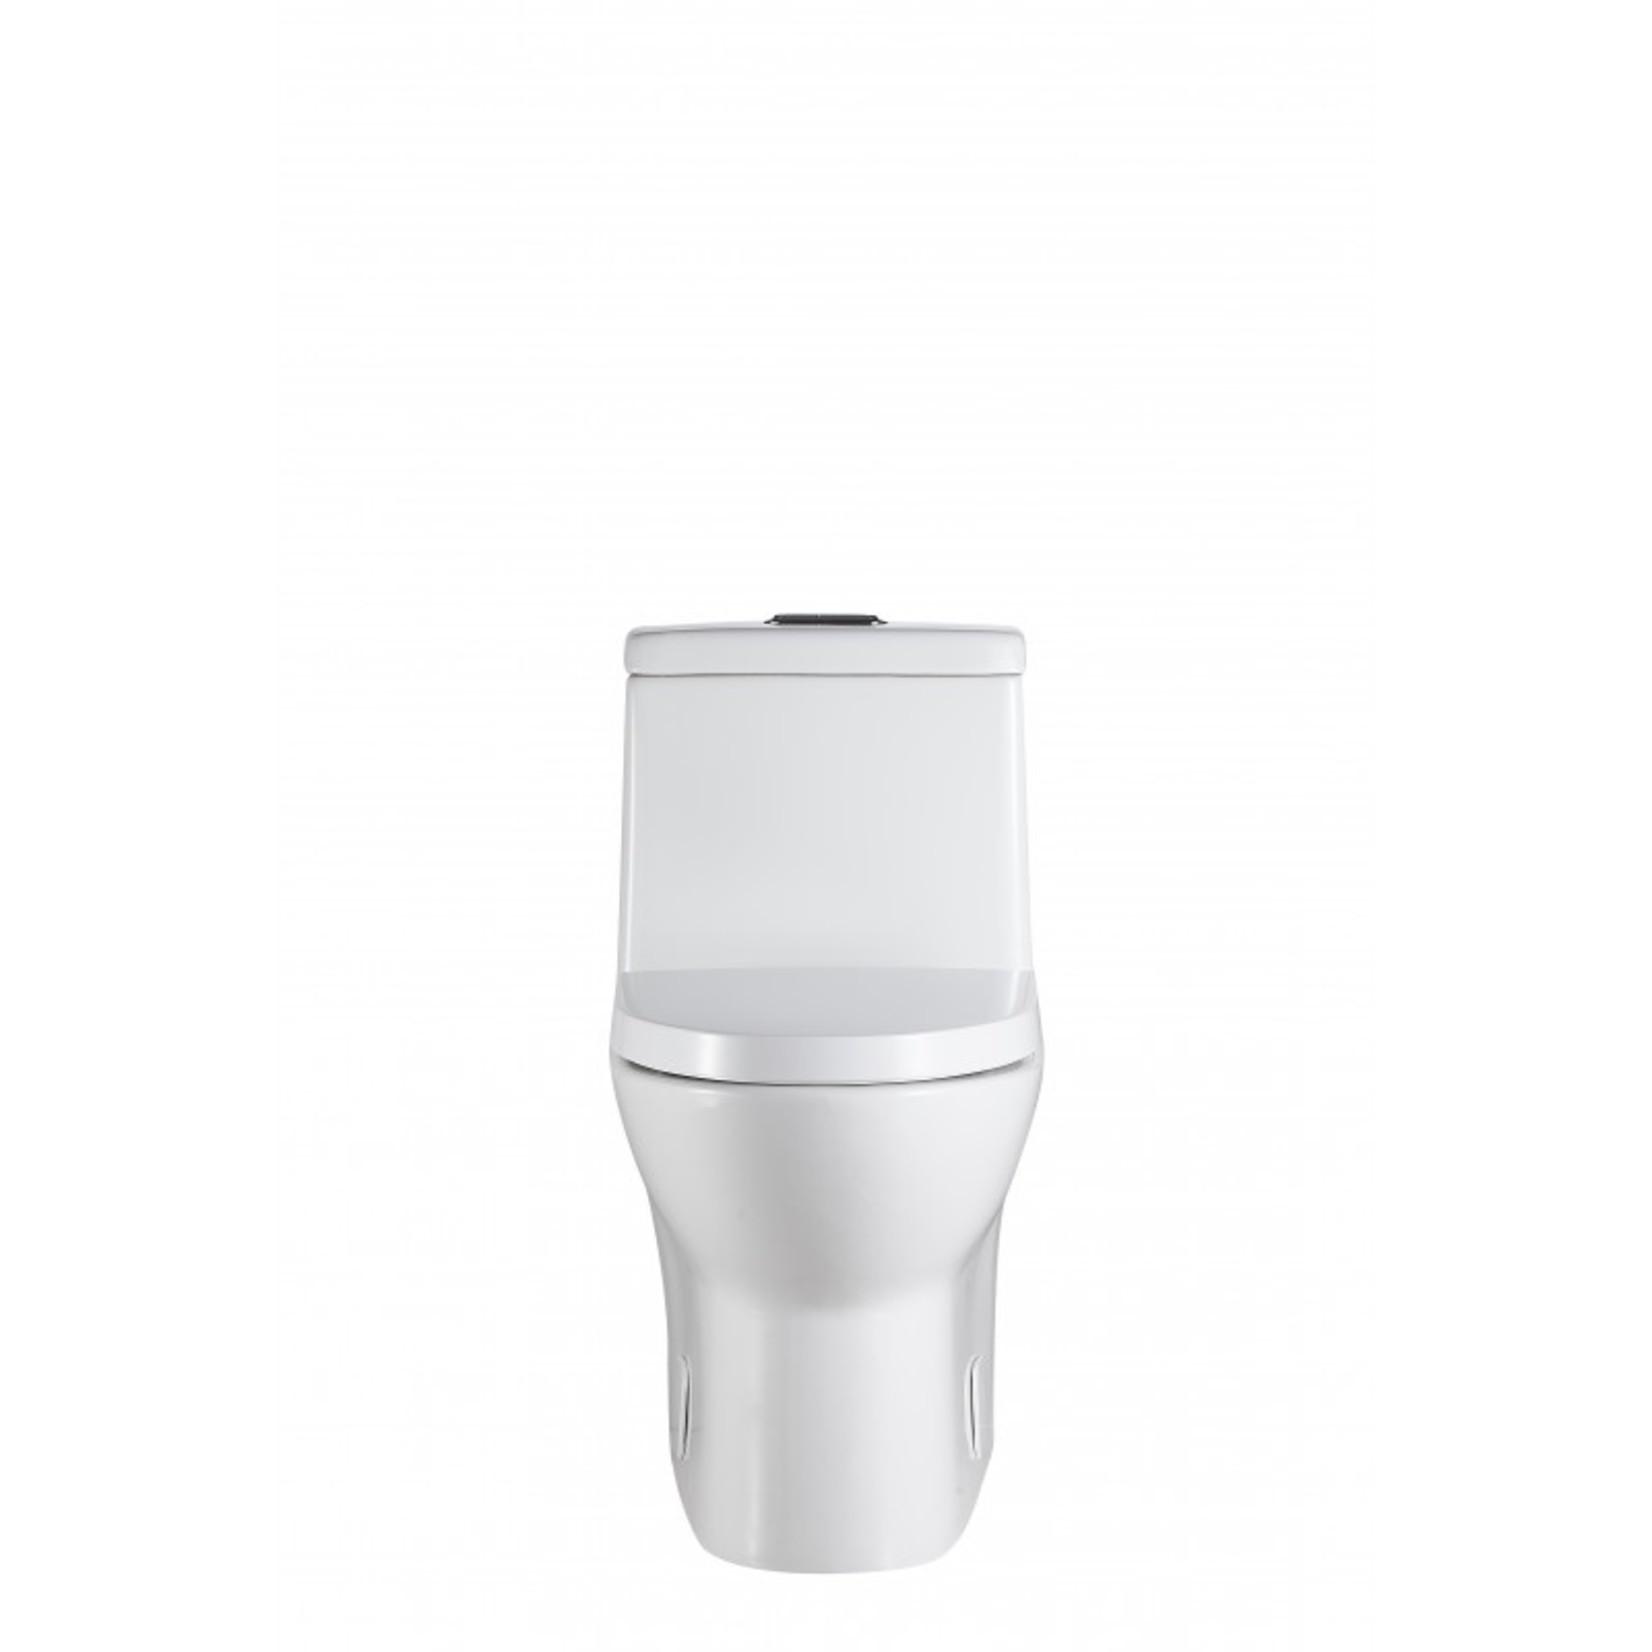 Toilette monopièce DI-153